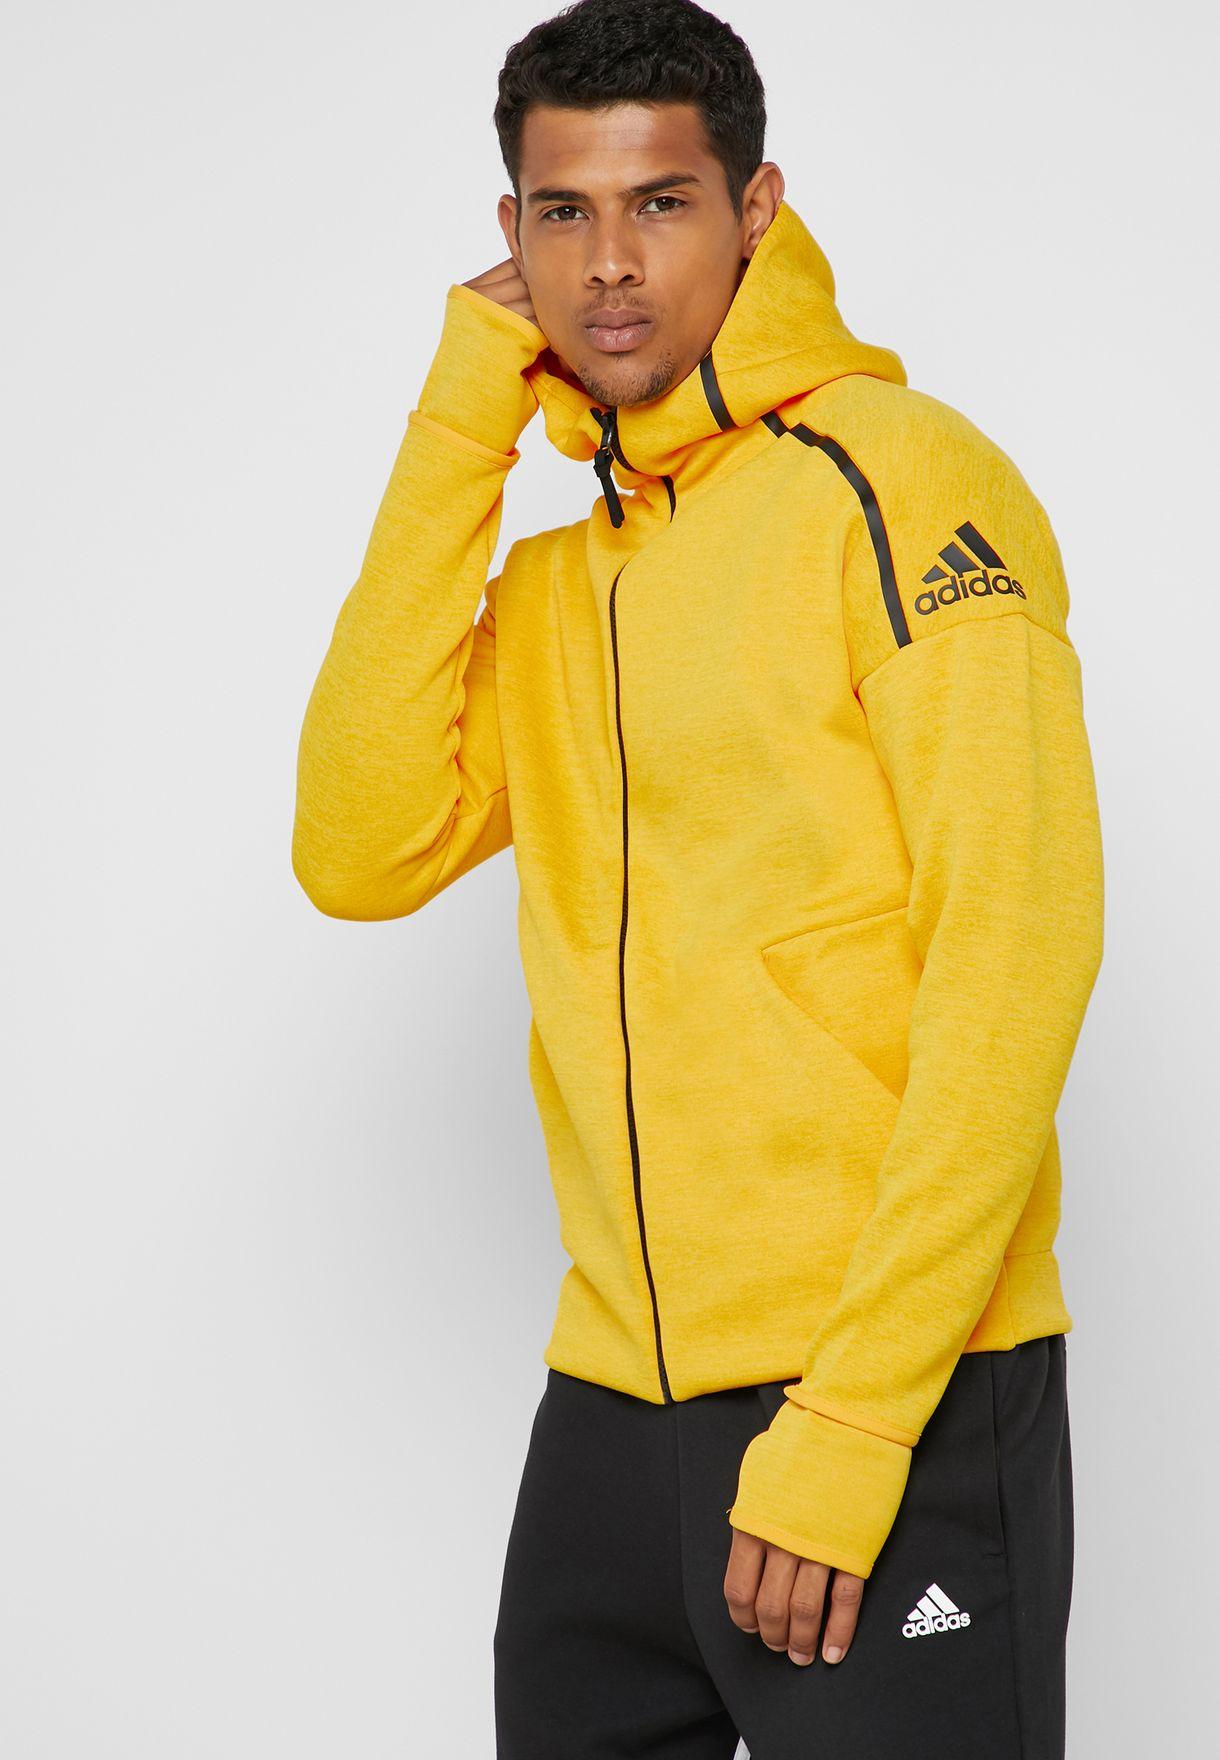 adidas yellow hoodie